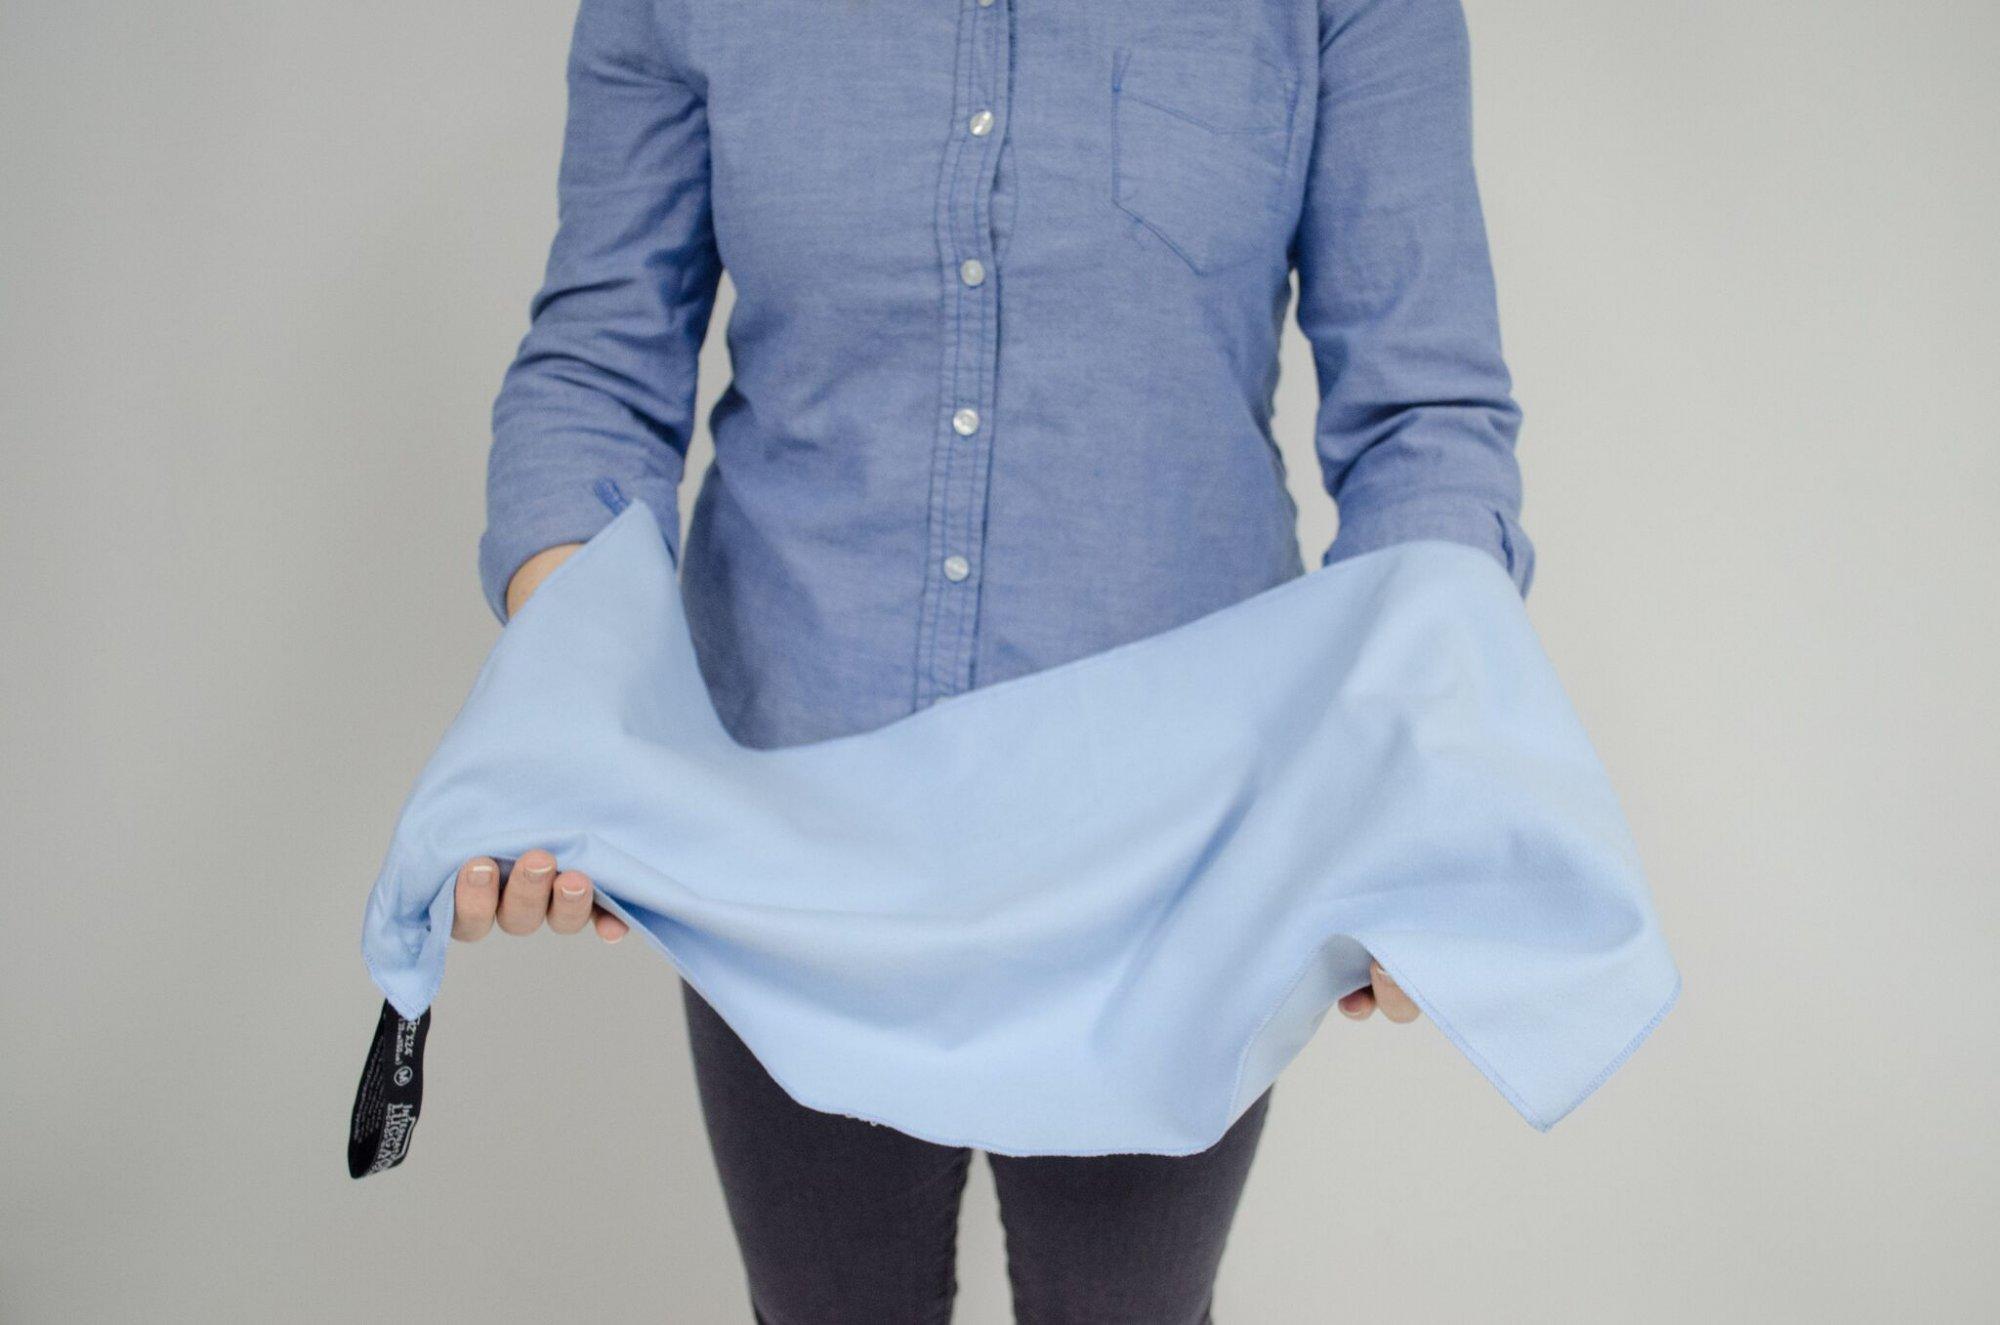 Microfiber Hand Towel Lighy Blue 12x24 International Luggage Collection MF24LB